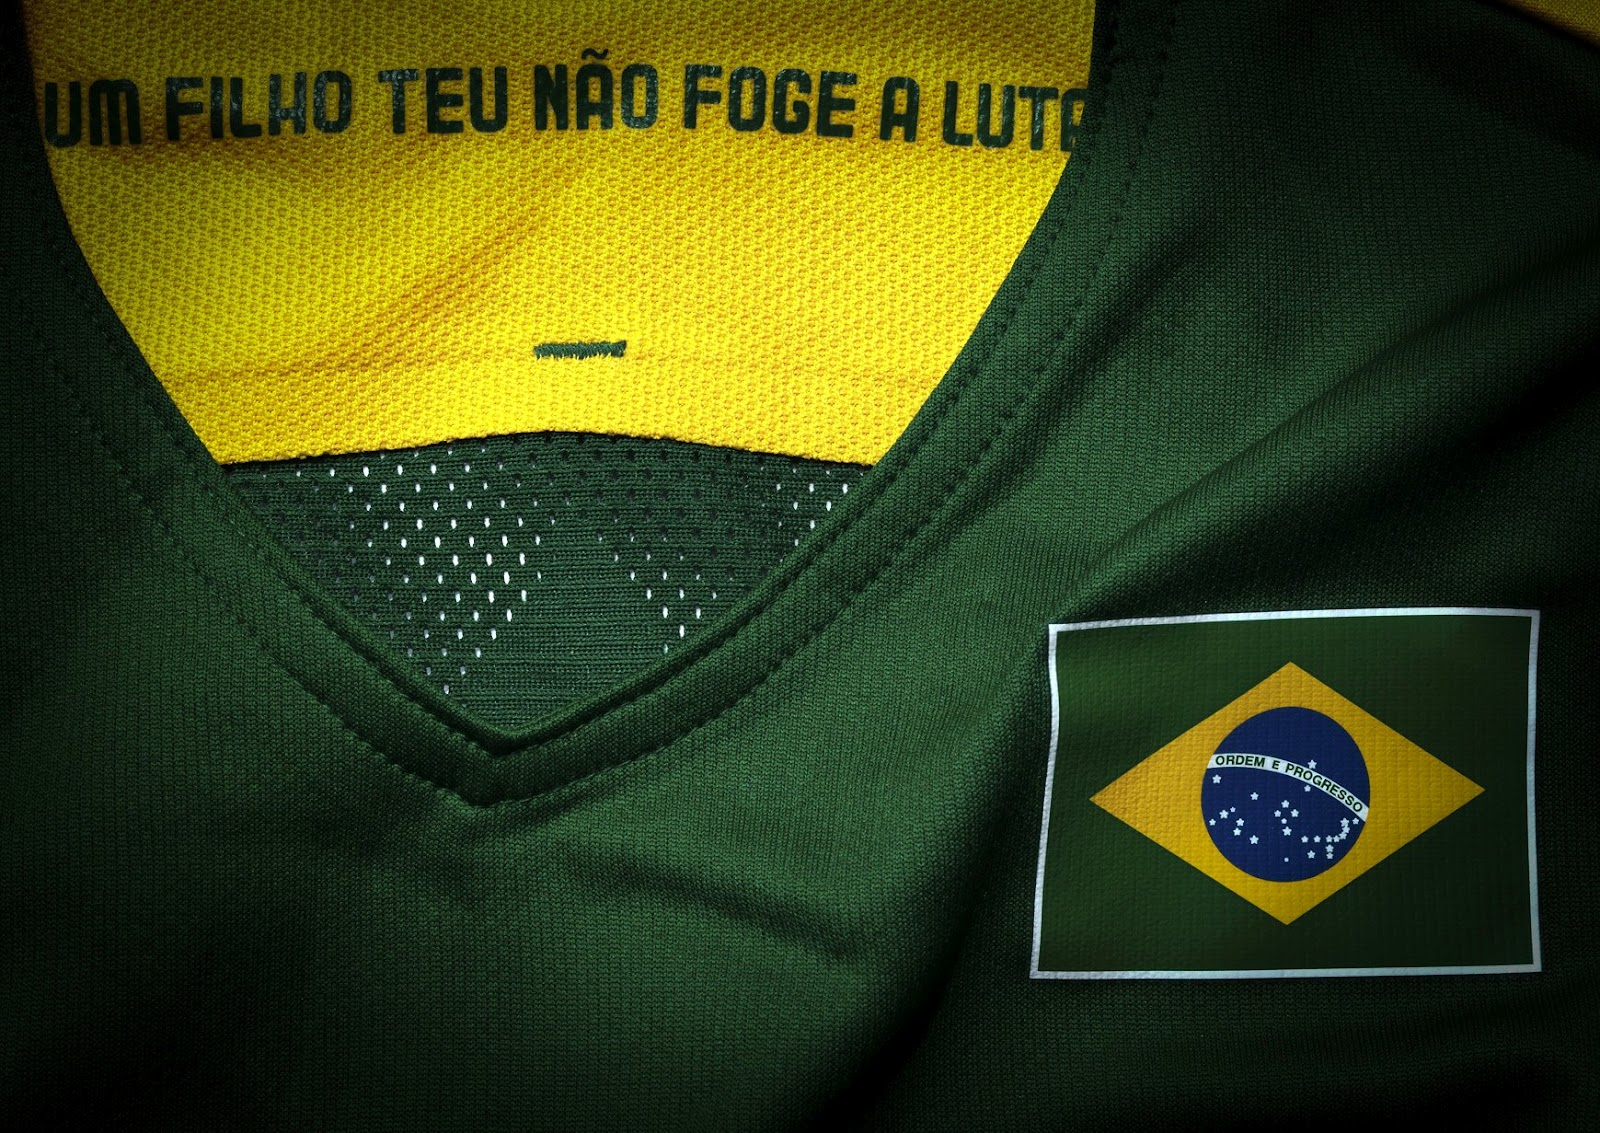 Basquete brasileiro veste Nike na Olimpíada de Londres 2012 - Show ... 81b3f799cfb35